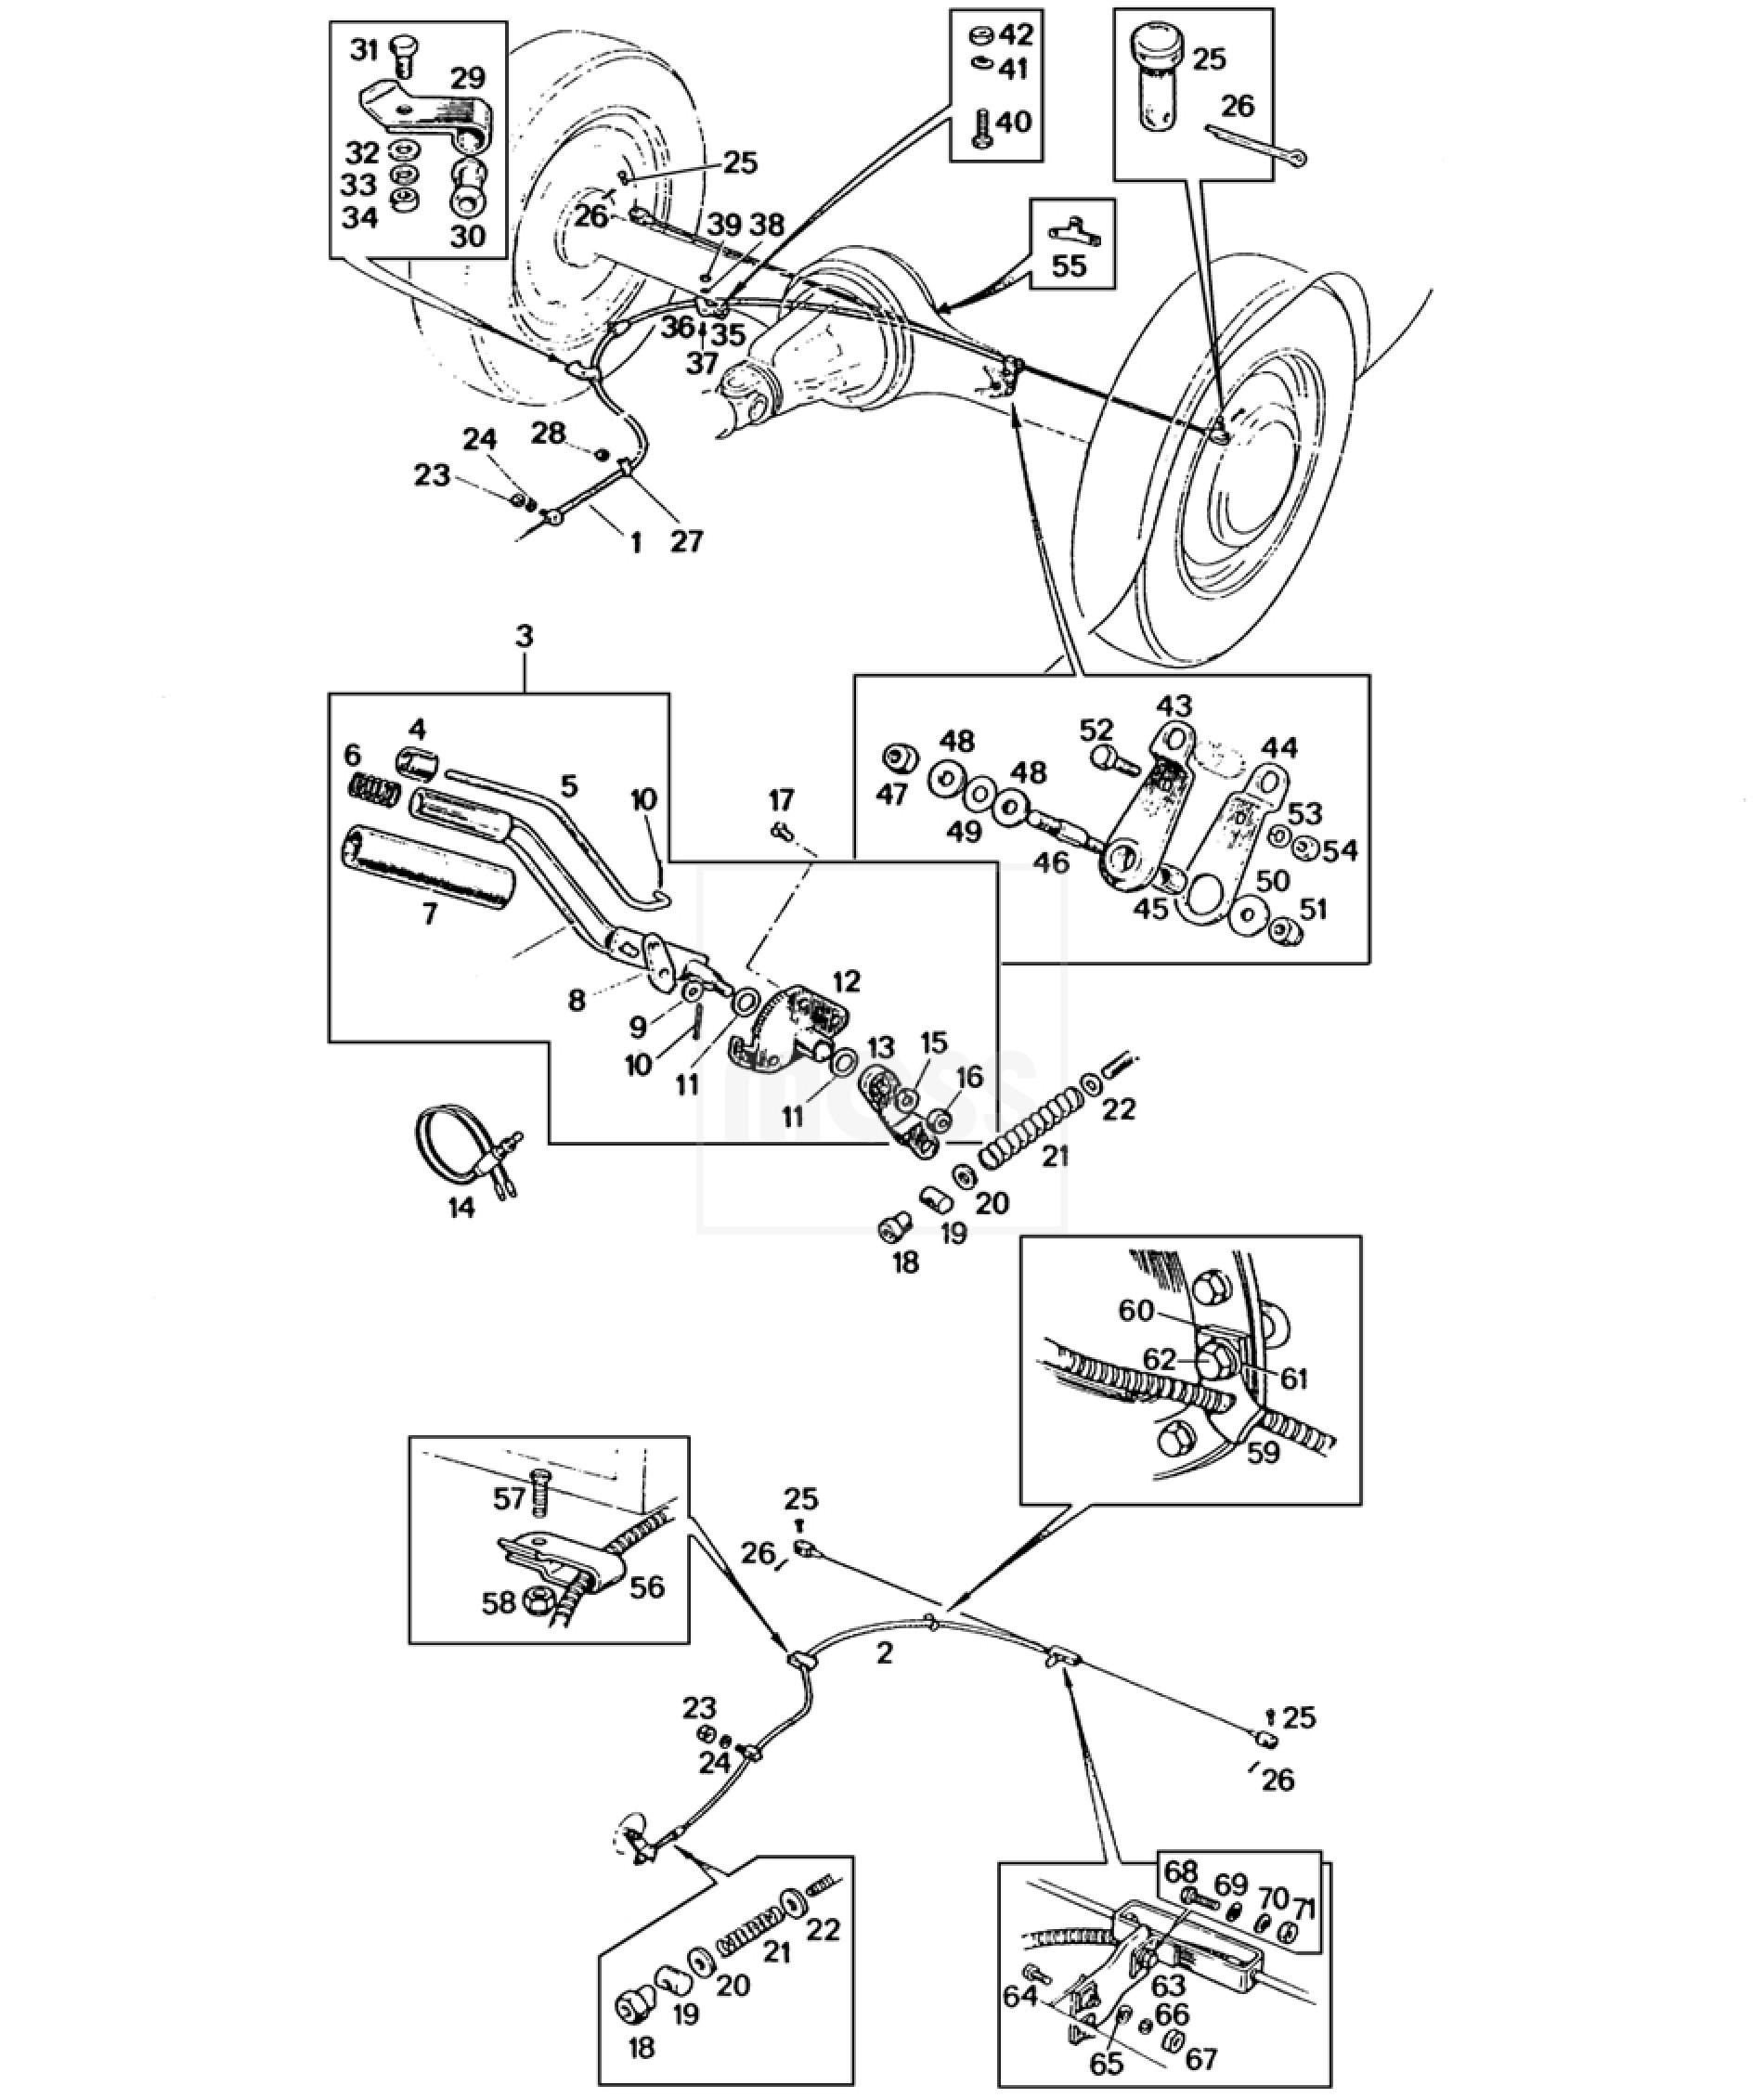 Handbrake Mechanism Amp Cables